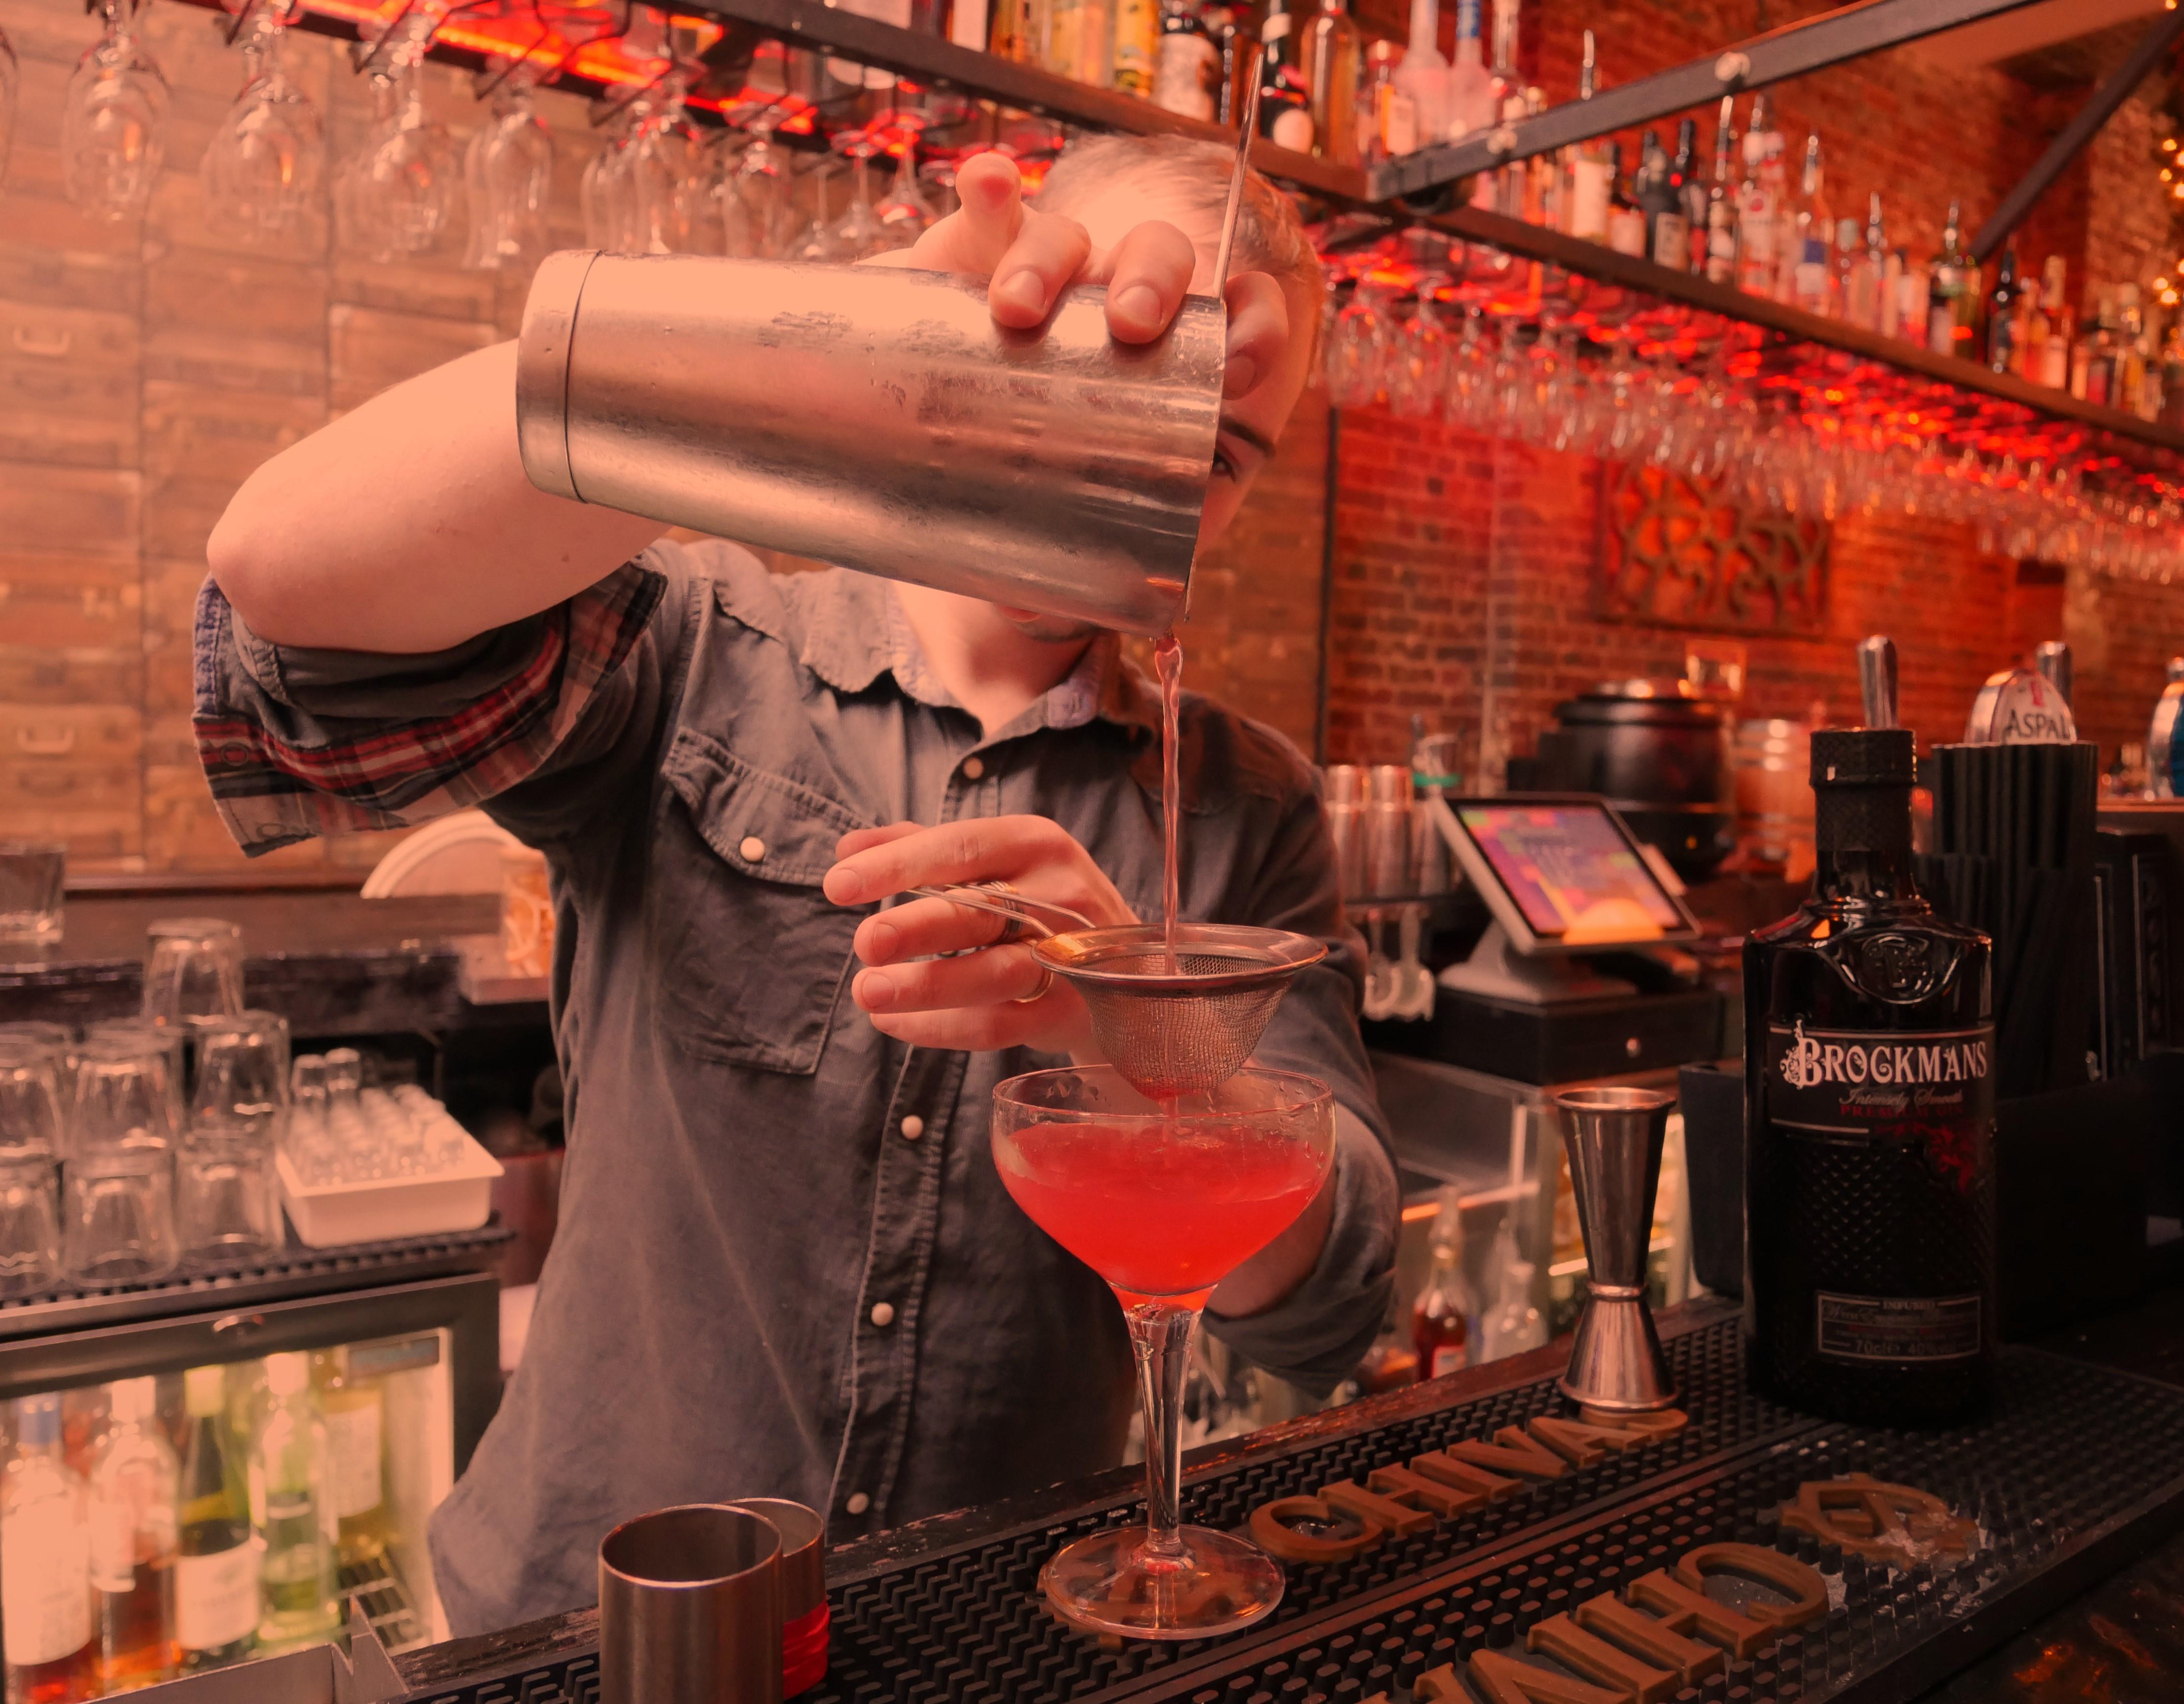 Bohemia bar brighton